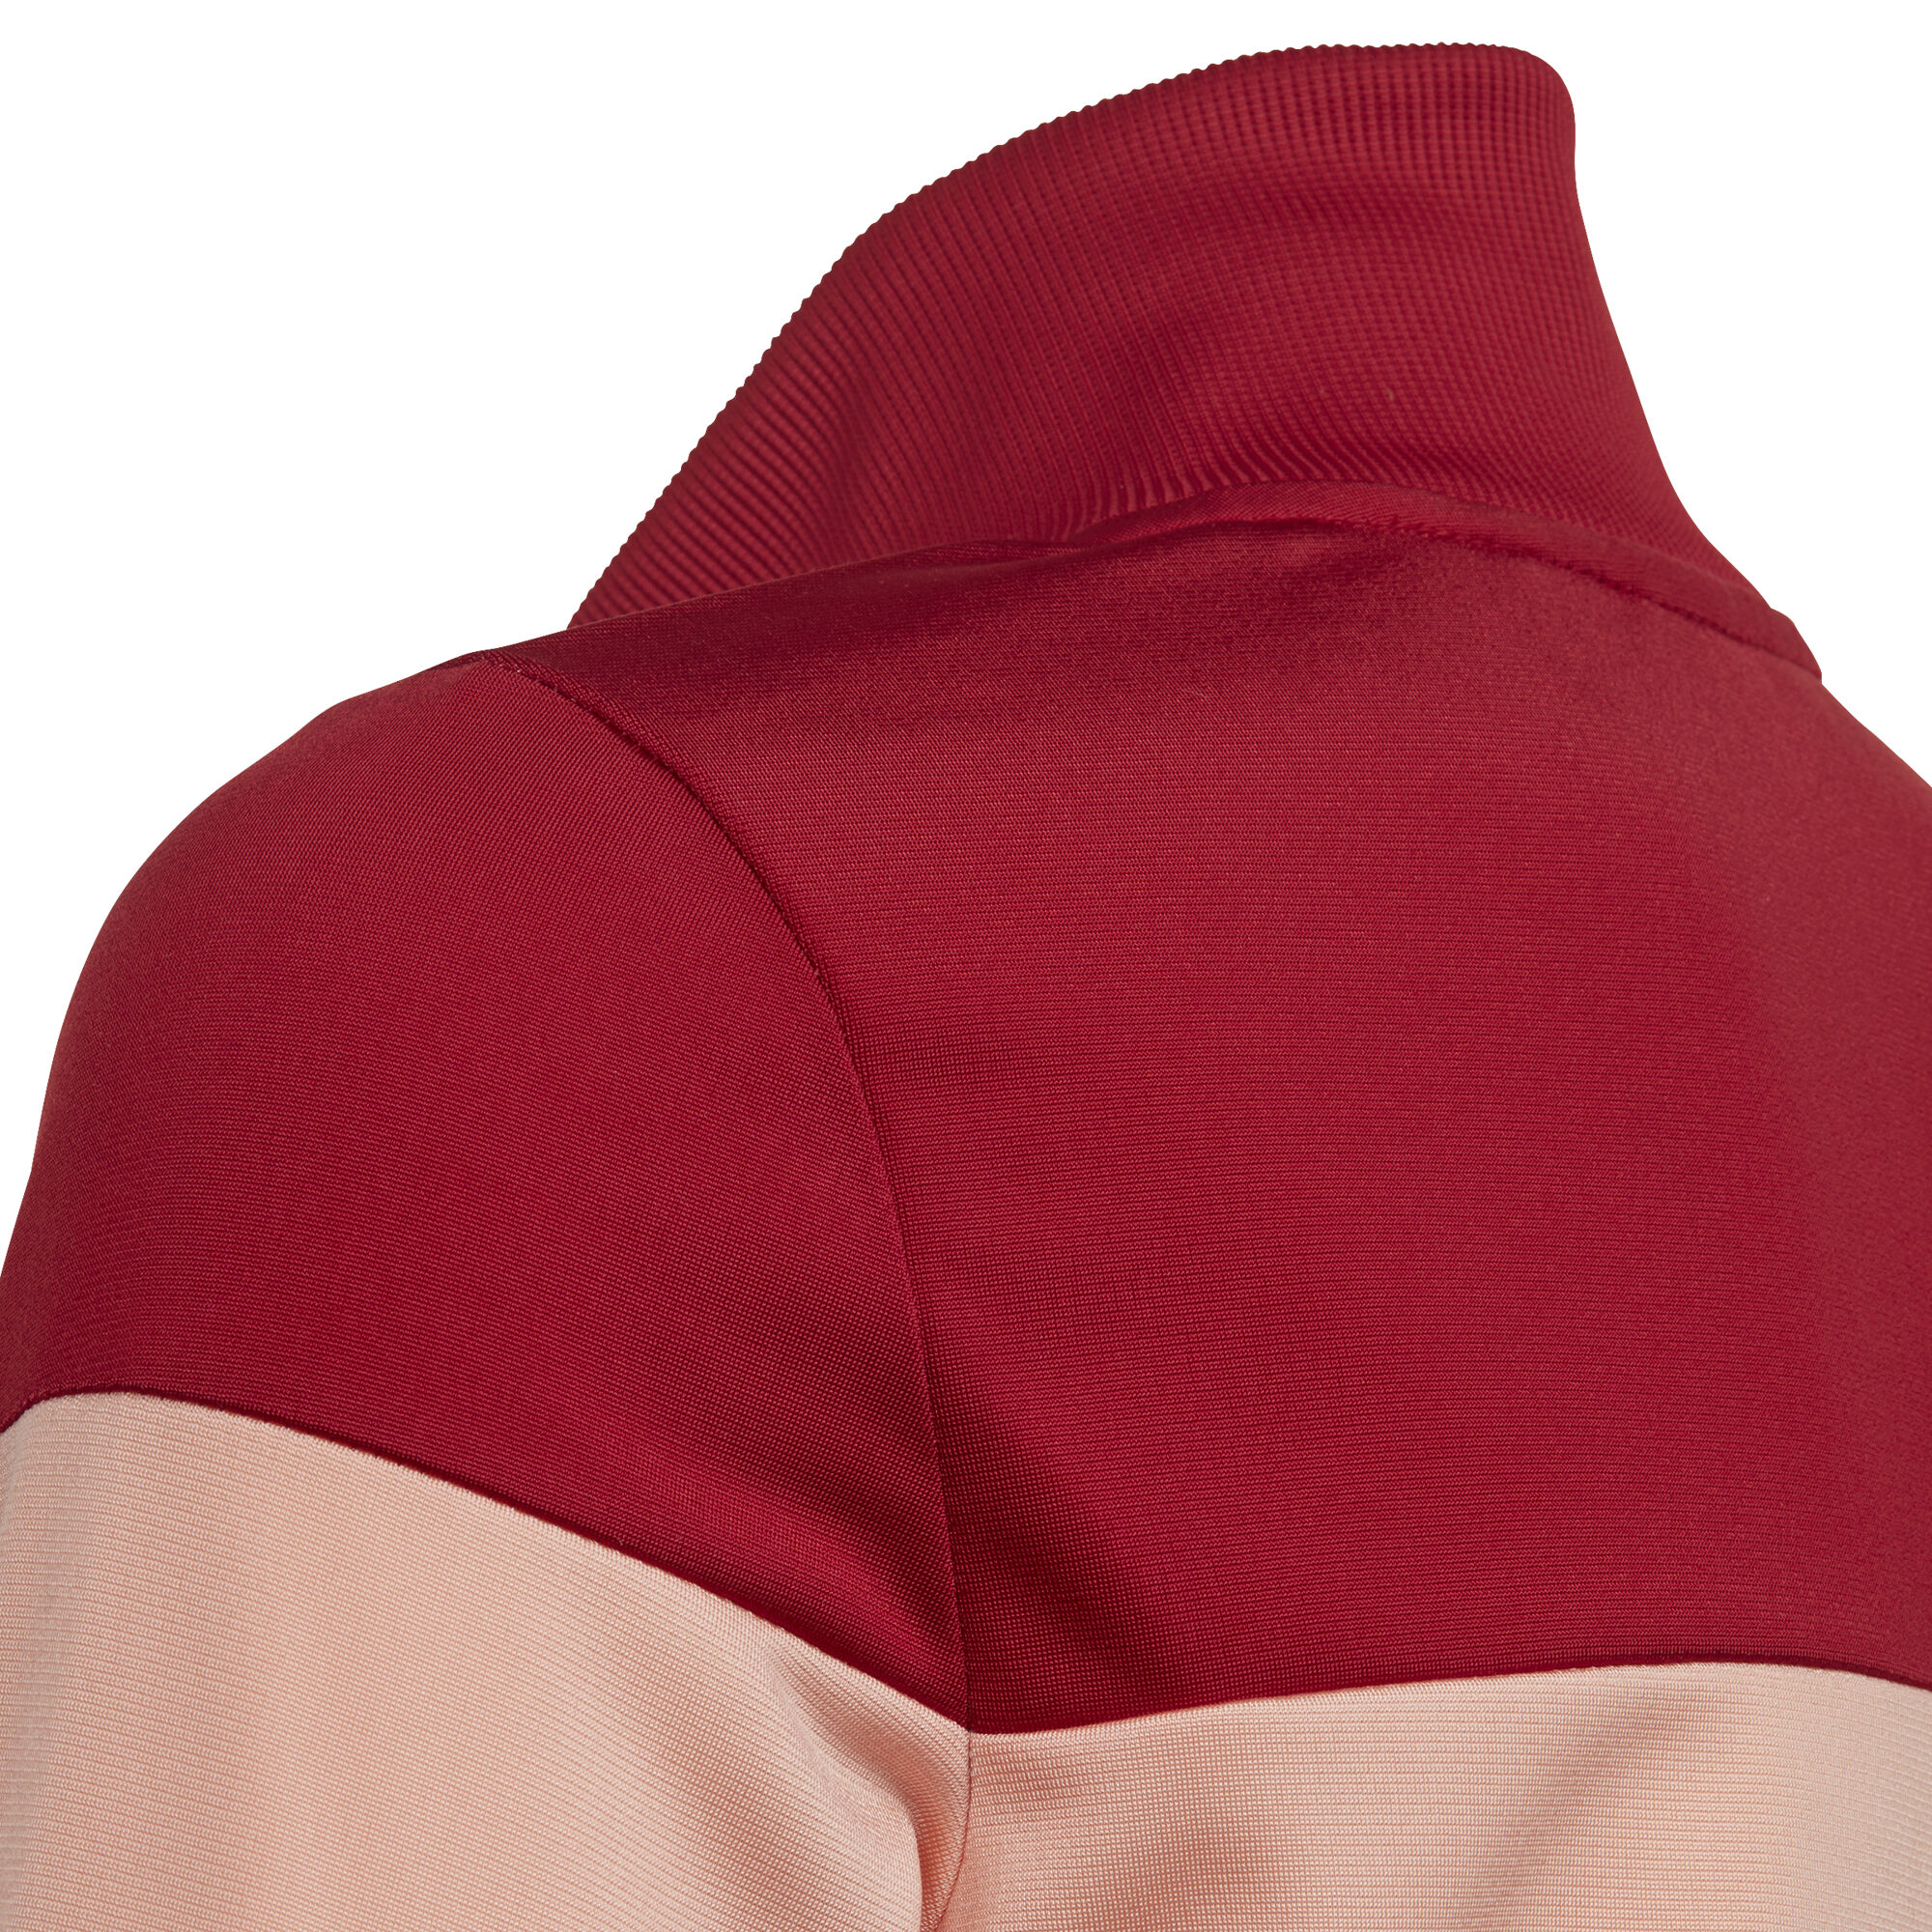 adidas compra RojoAlbaricoque Chándal Chicas Polyester UzMpGqVS